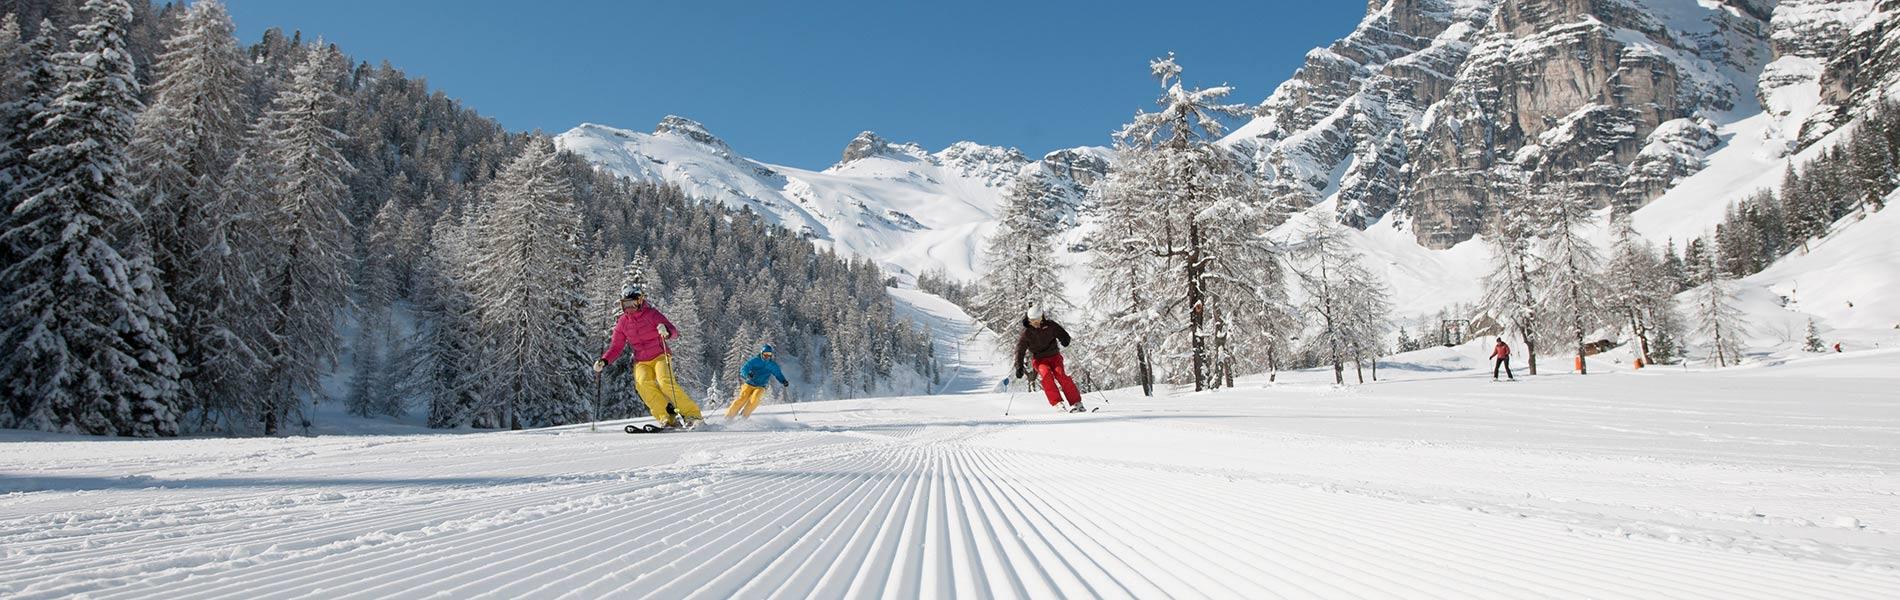 Skiurlaub in Tirol Urlaub im Hotel Happy Stubai Neustift